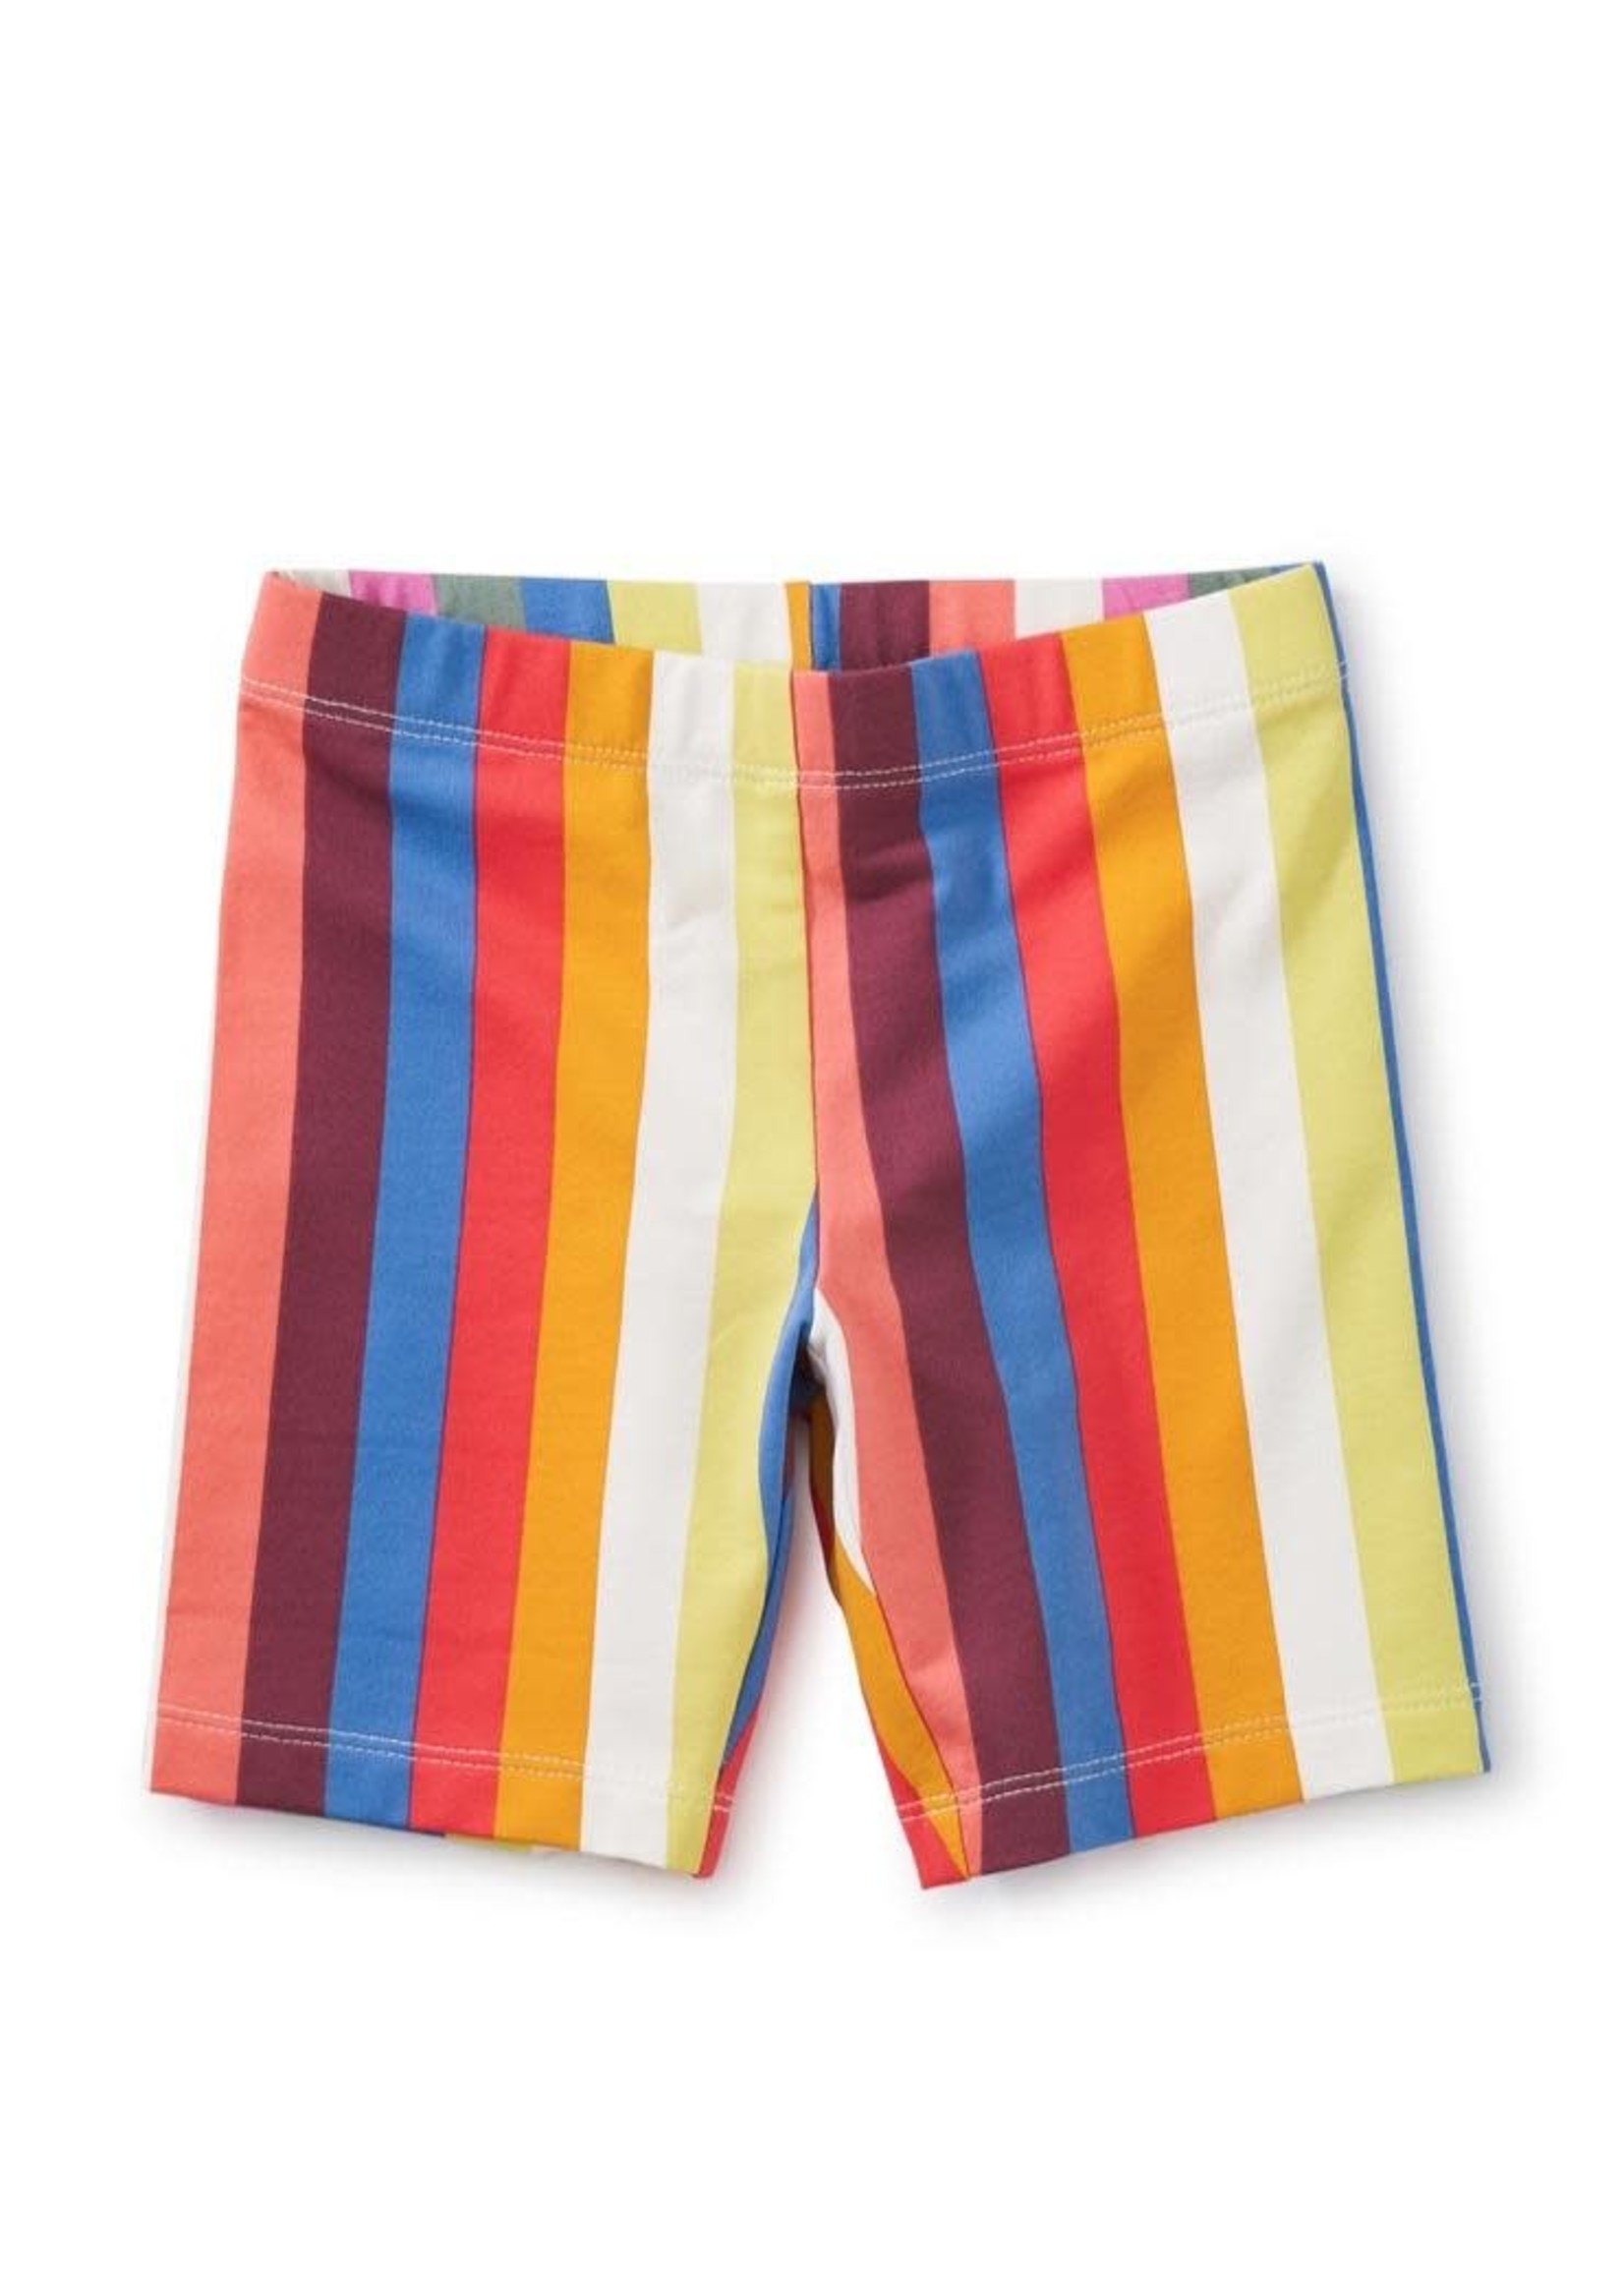 Tea Collection Vibrant Stripe, Printed Bike Shorts